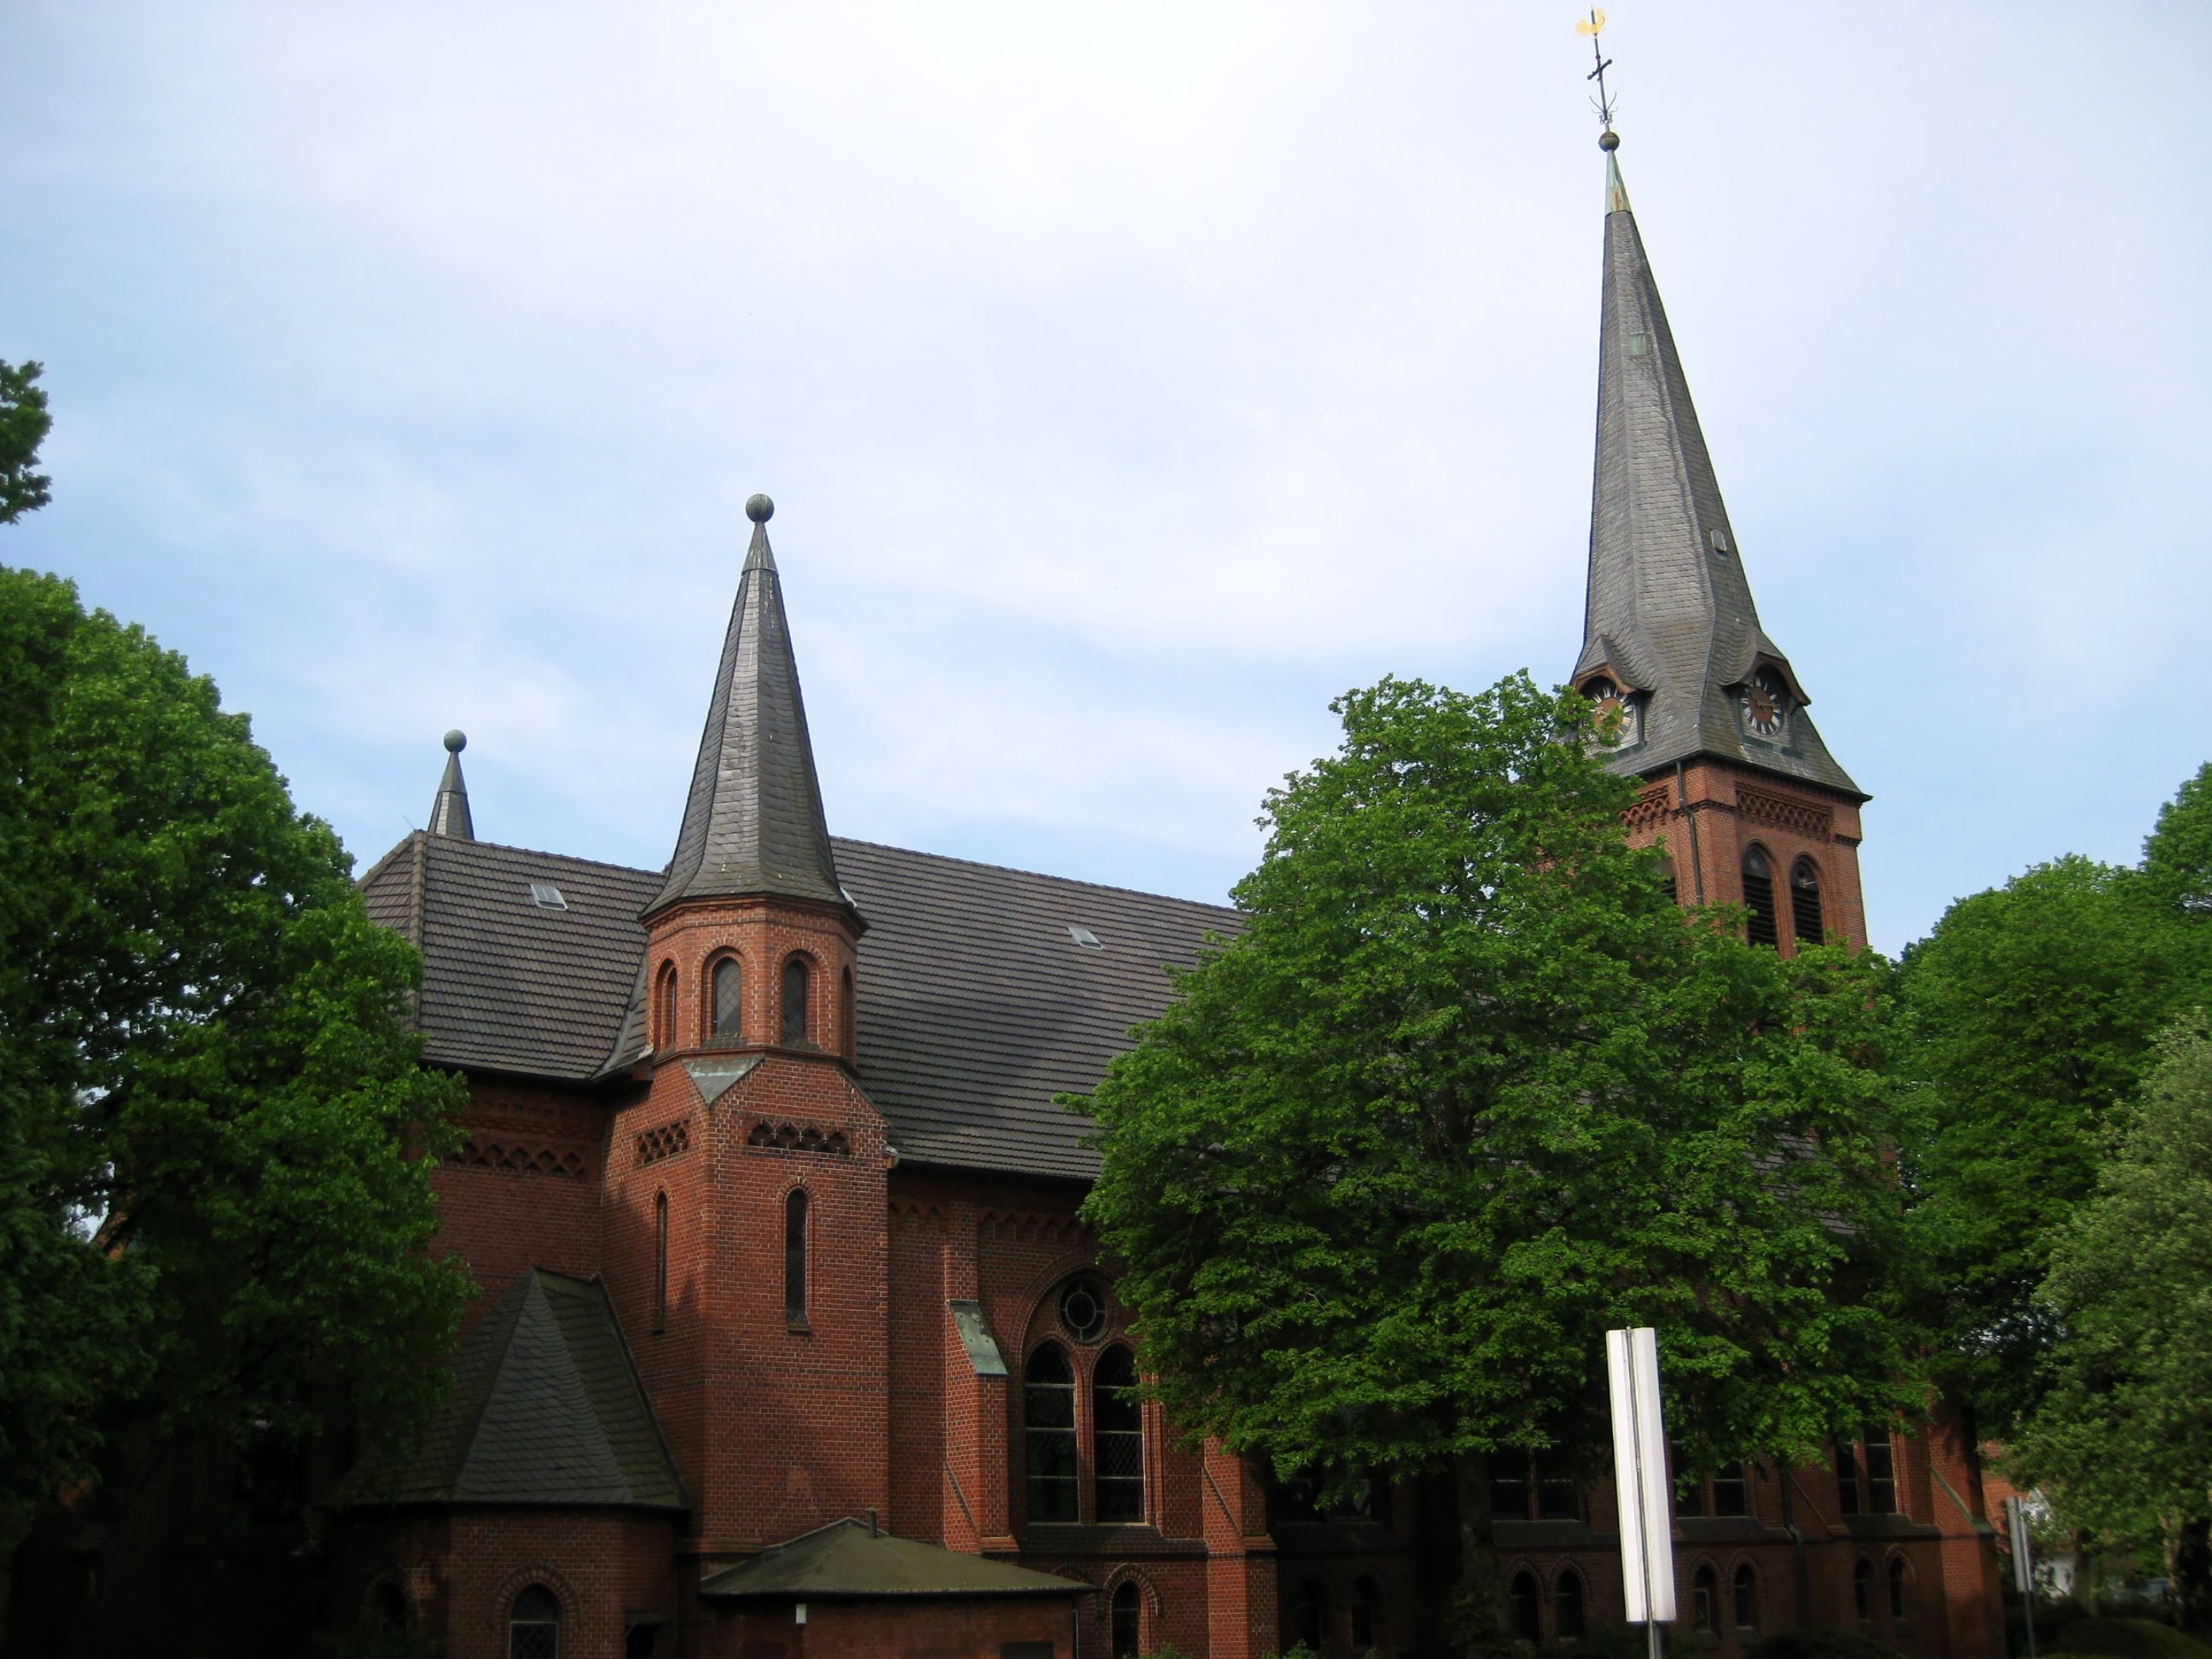 Bielefeld kirche rumänisch orthodoxe Religiöse Feiertage